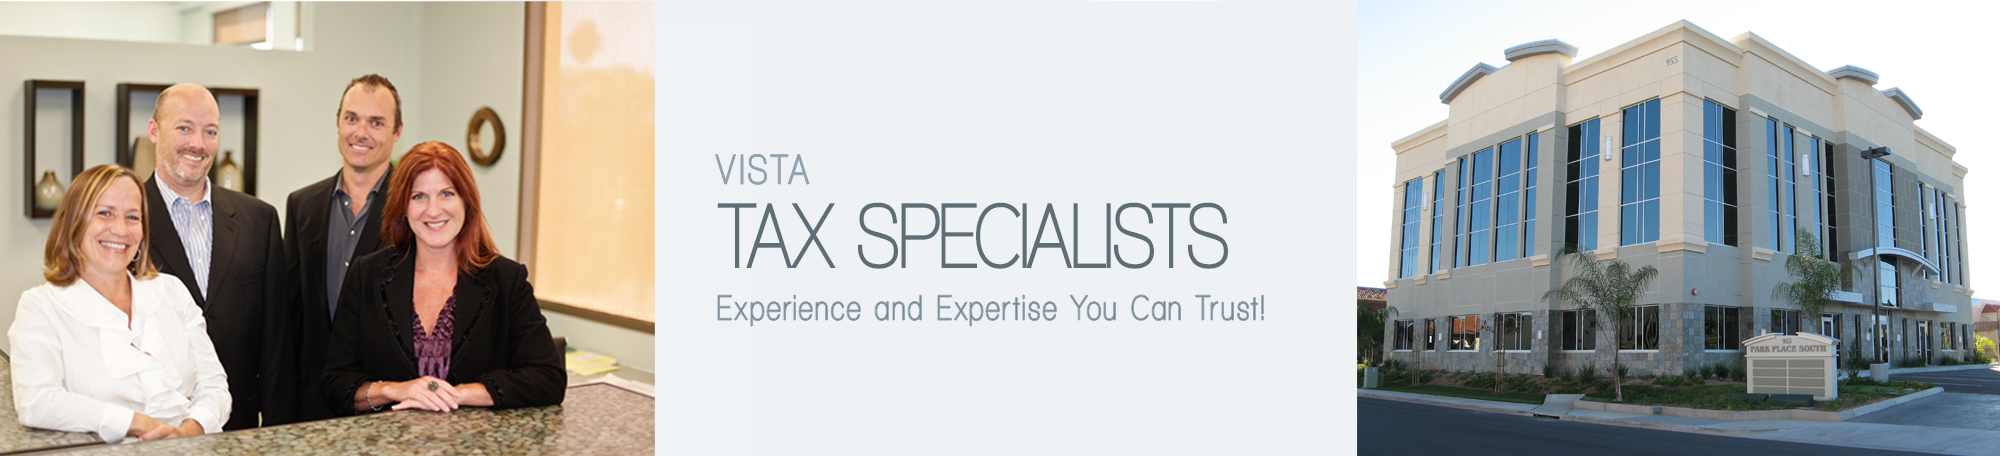 Vista Tax Specialists